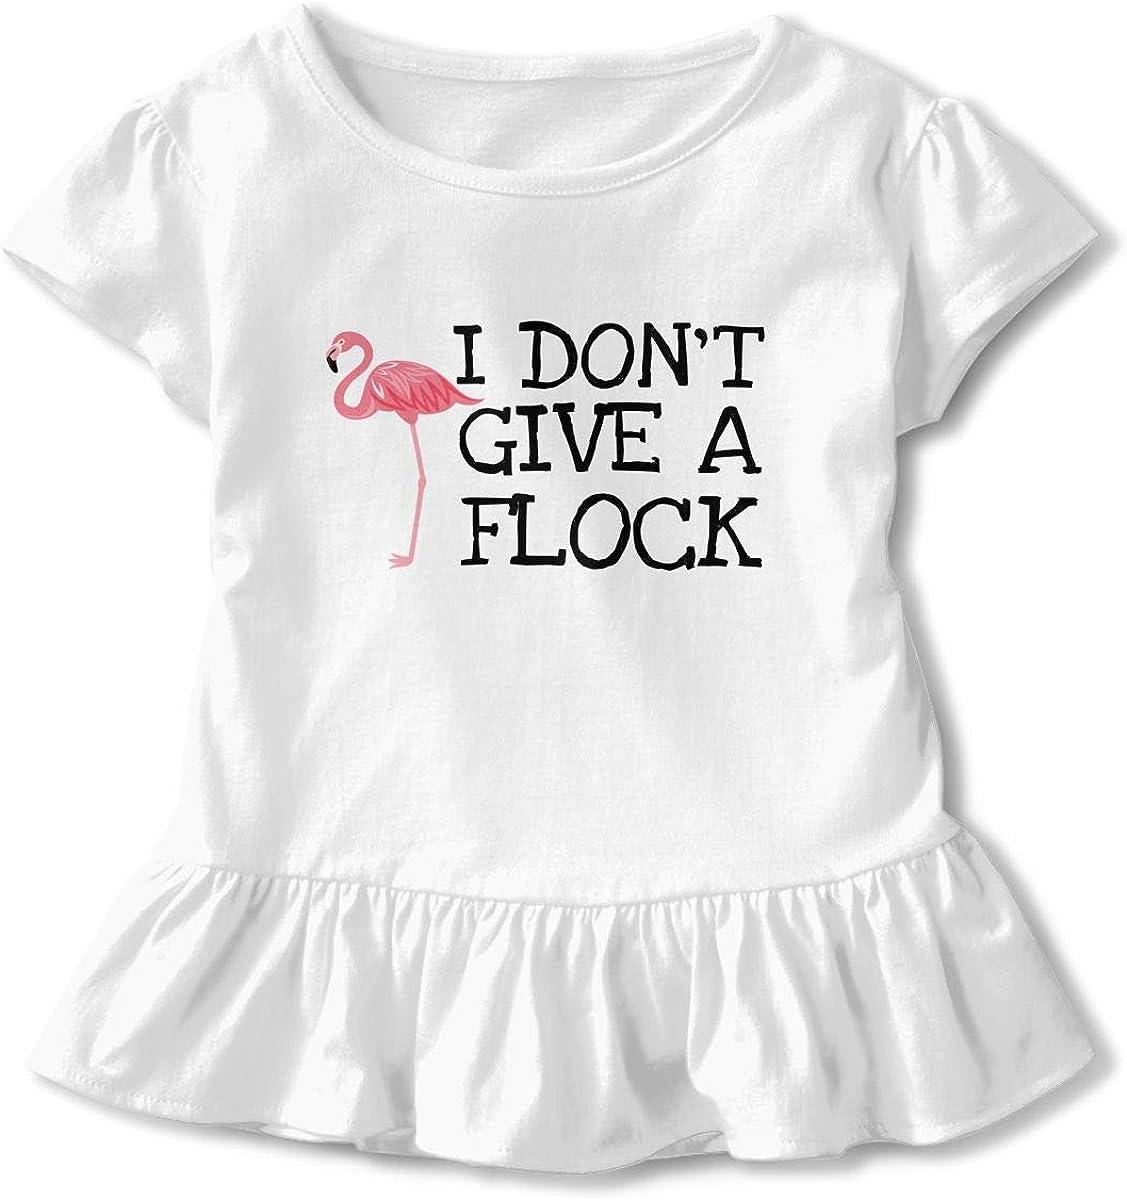 Cheng Jian Bo Im Dont Give A Flock Toddler Girls T Shirt Kids Cotton Short Sleeve Ruffle Tee